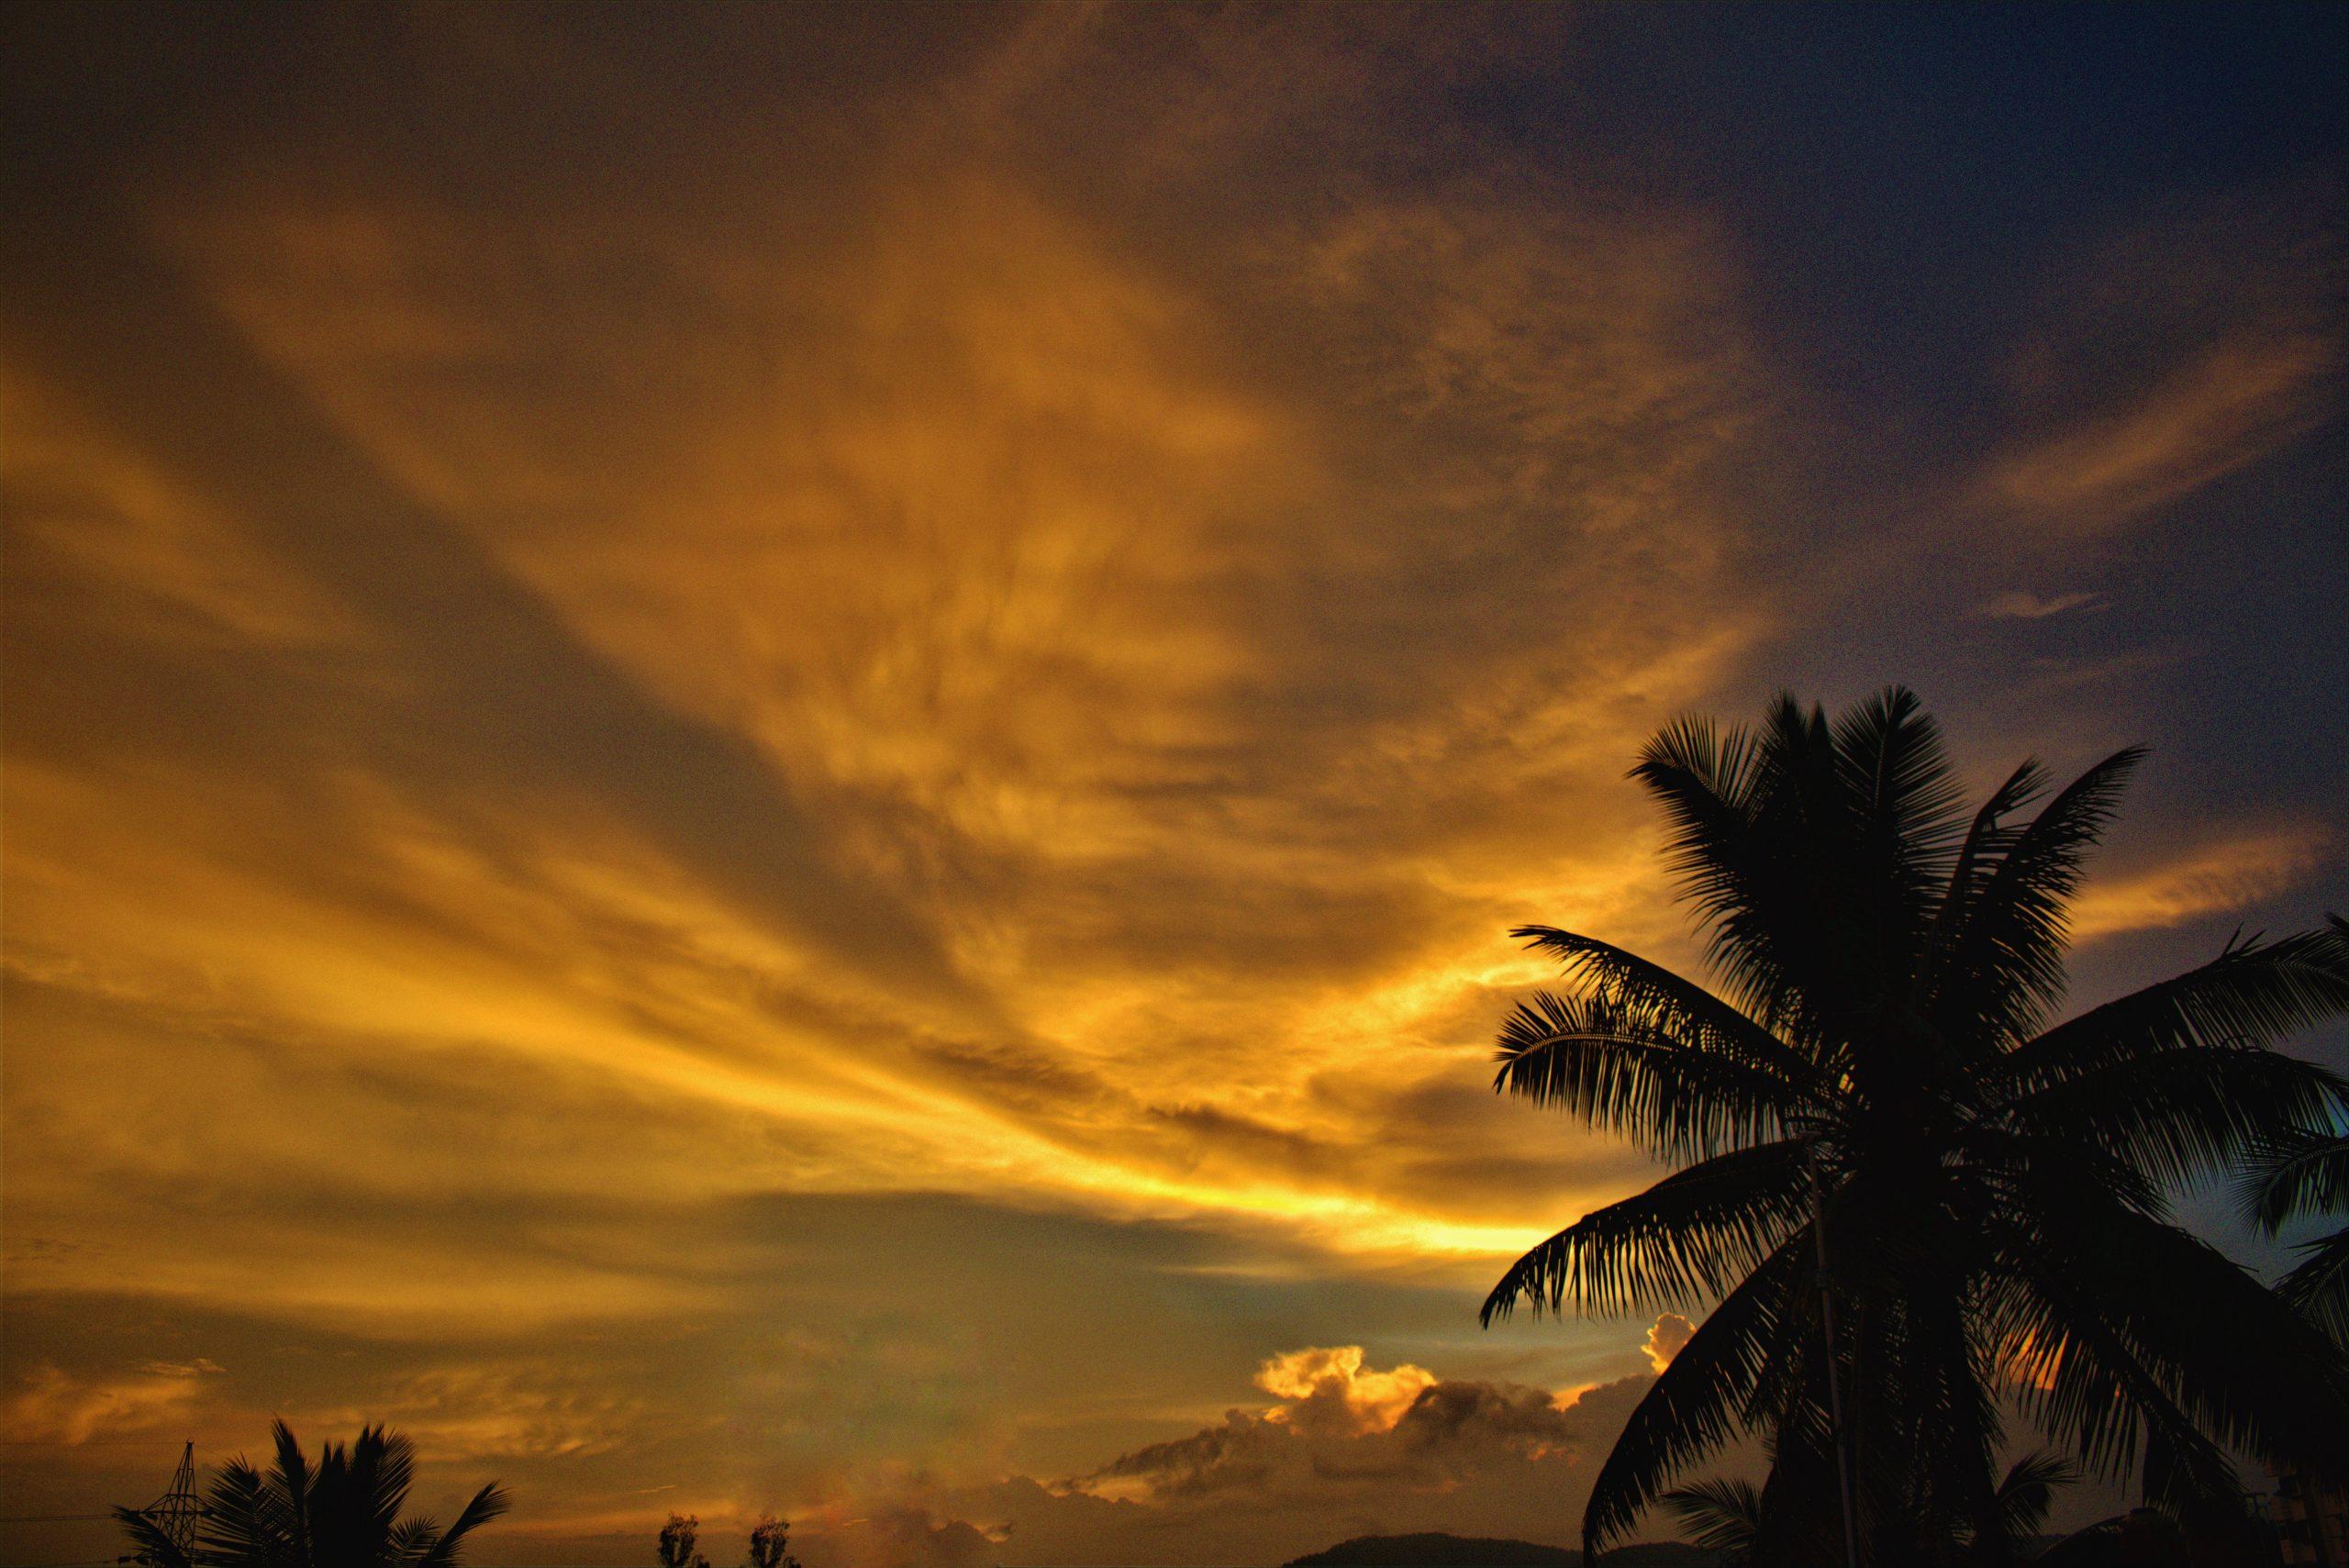 Orange sunset sky with palm tree silhouette